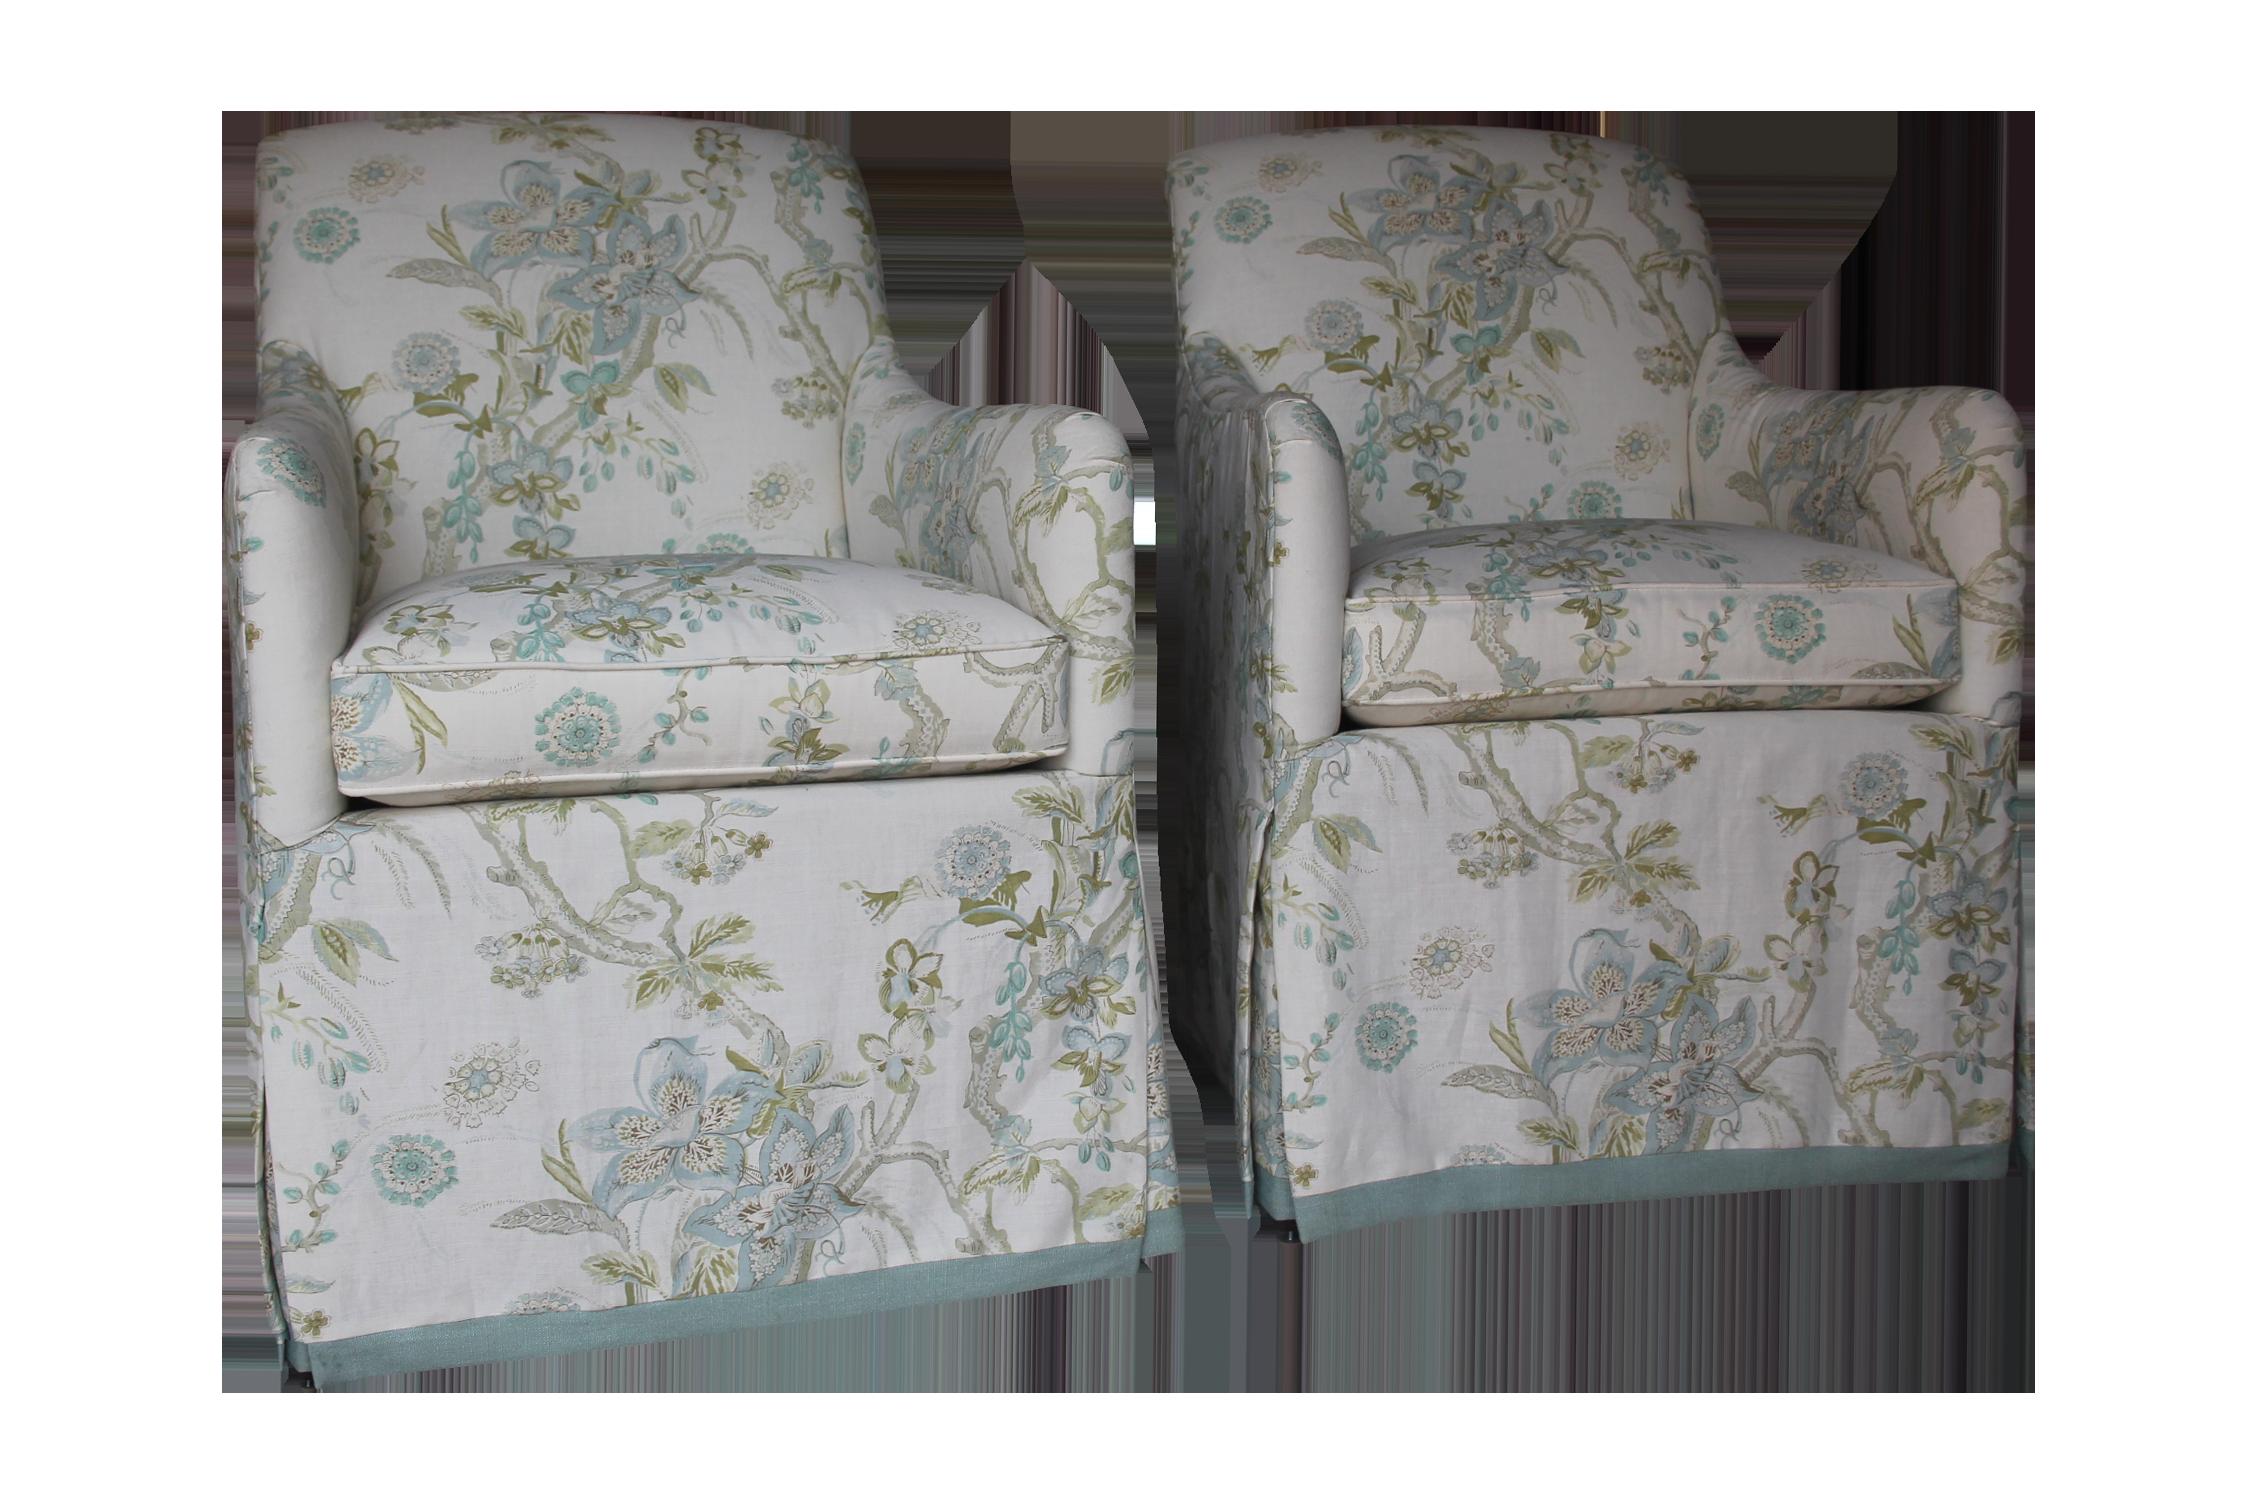 Lindsay Chair, Hickory Chair Furniture - Pair  Furniture chair